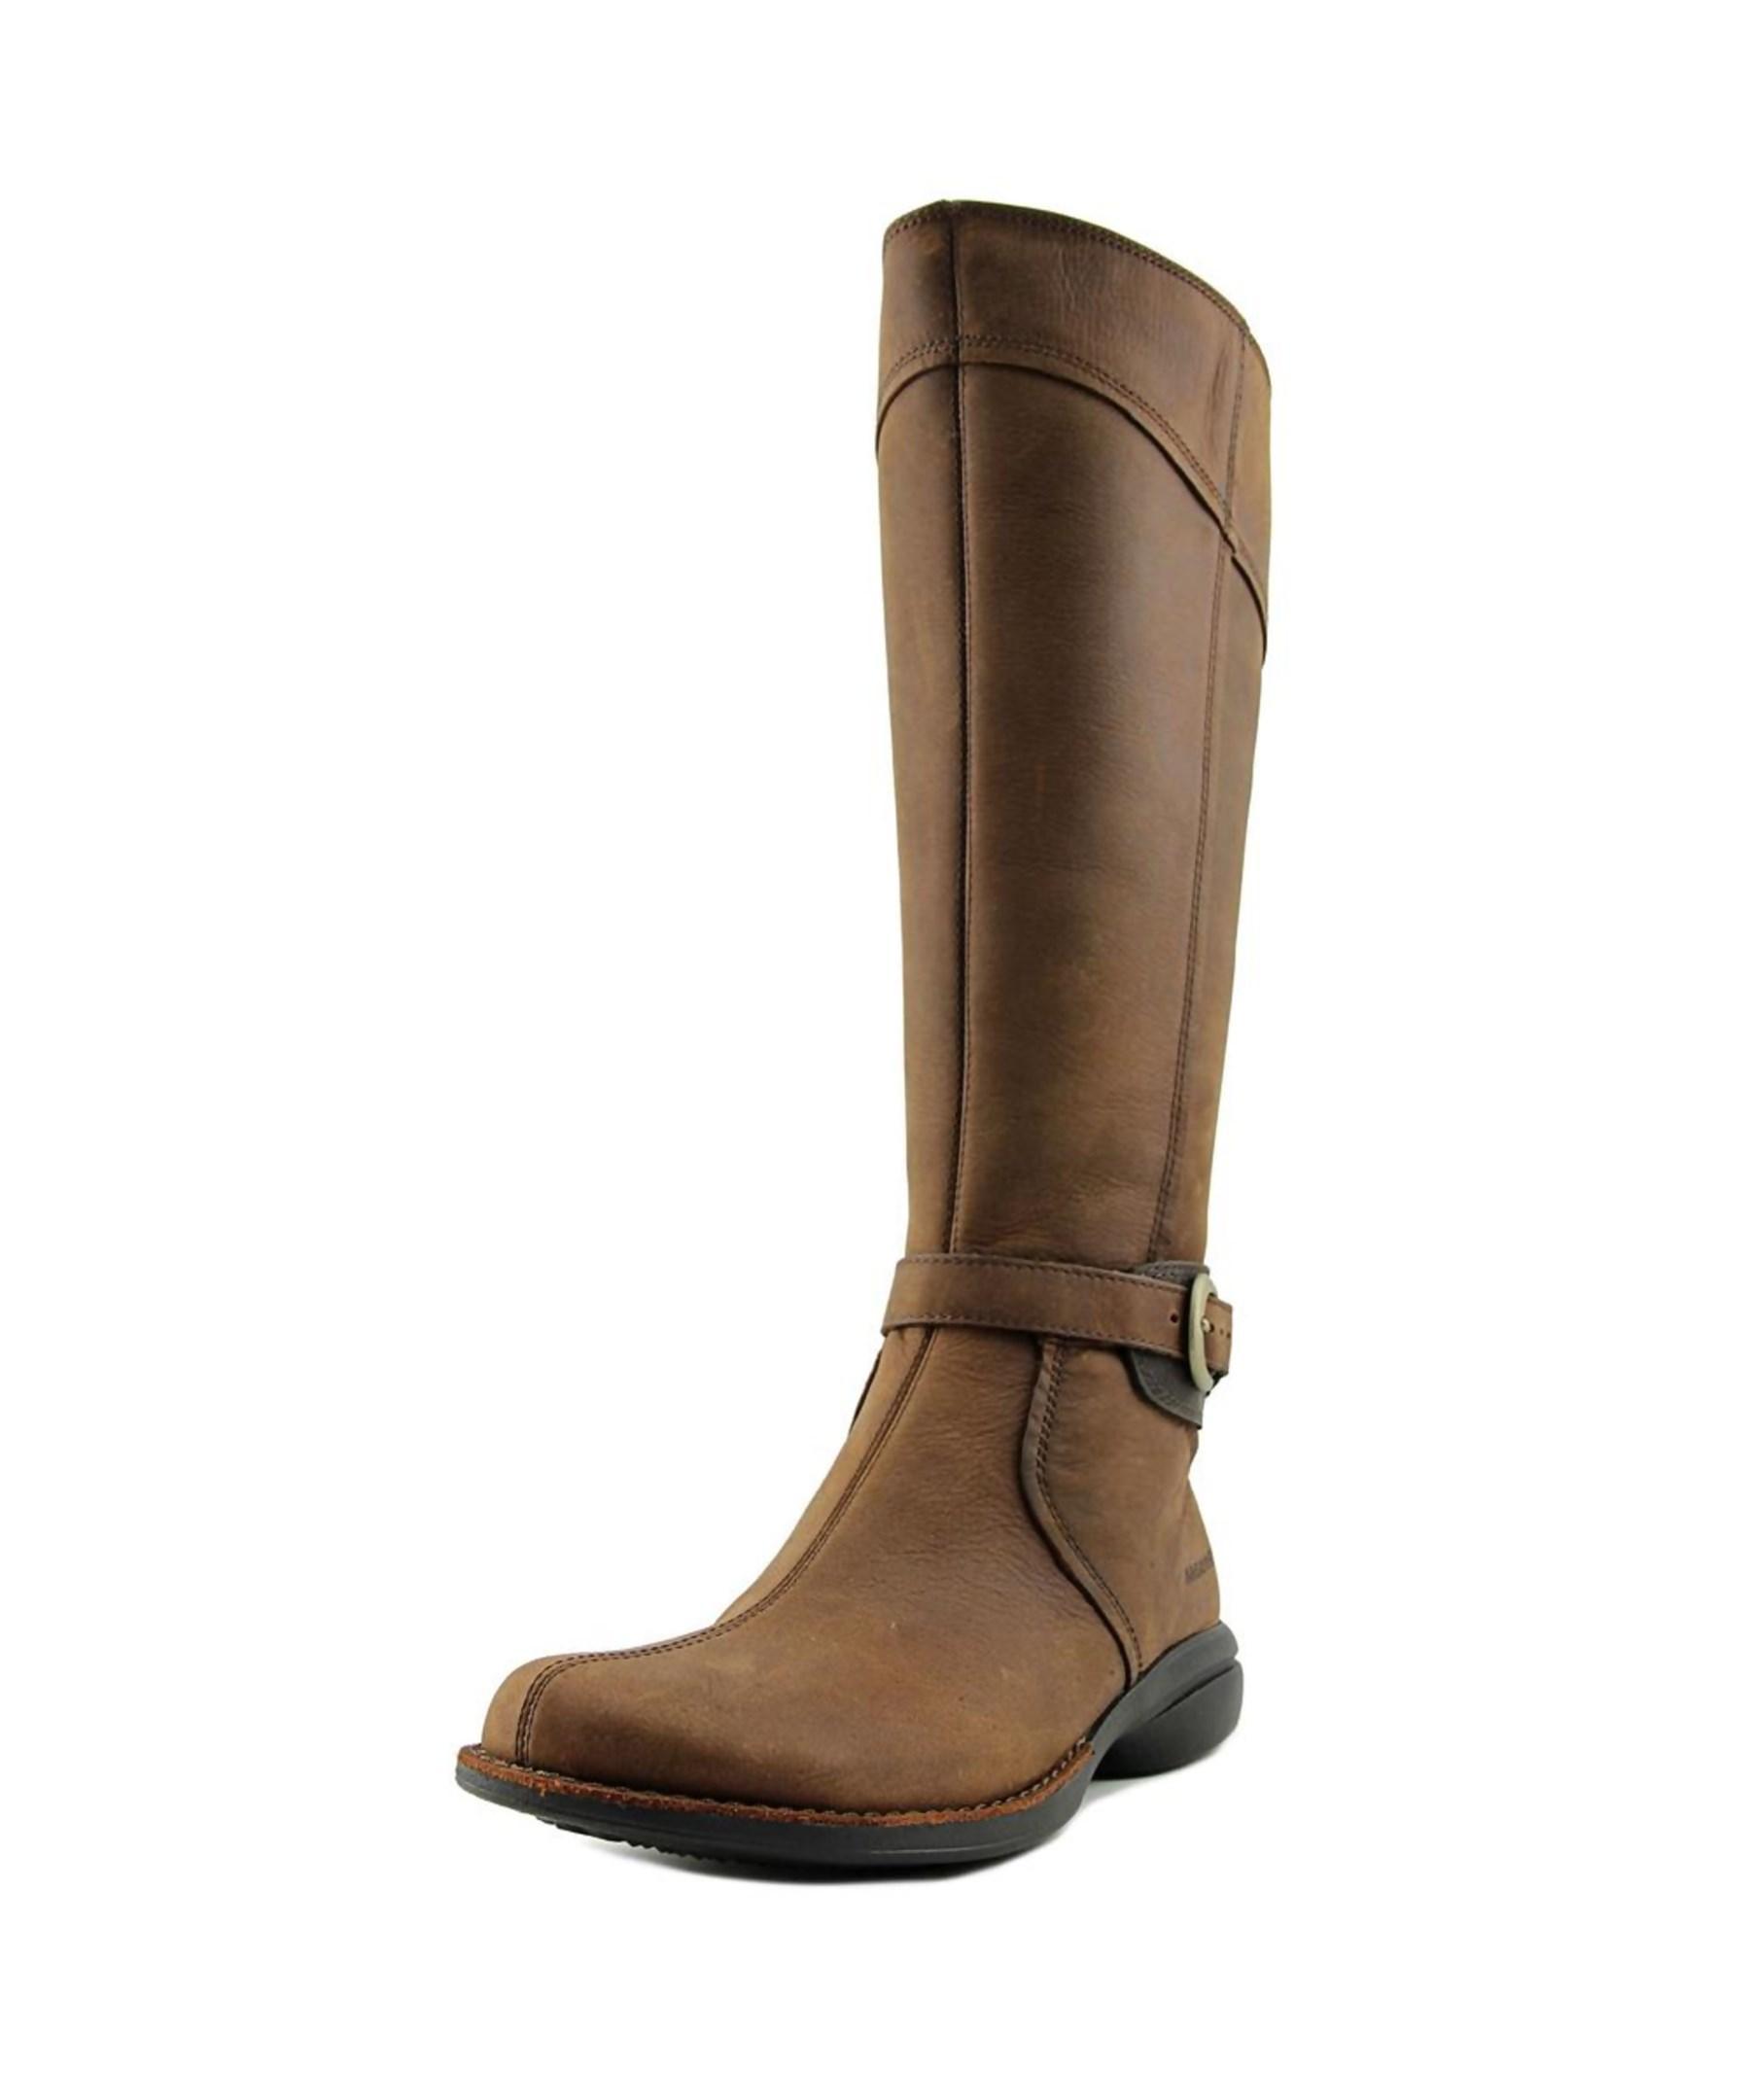 merrell captiva buckle up weatherproof toe